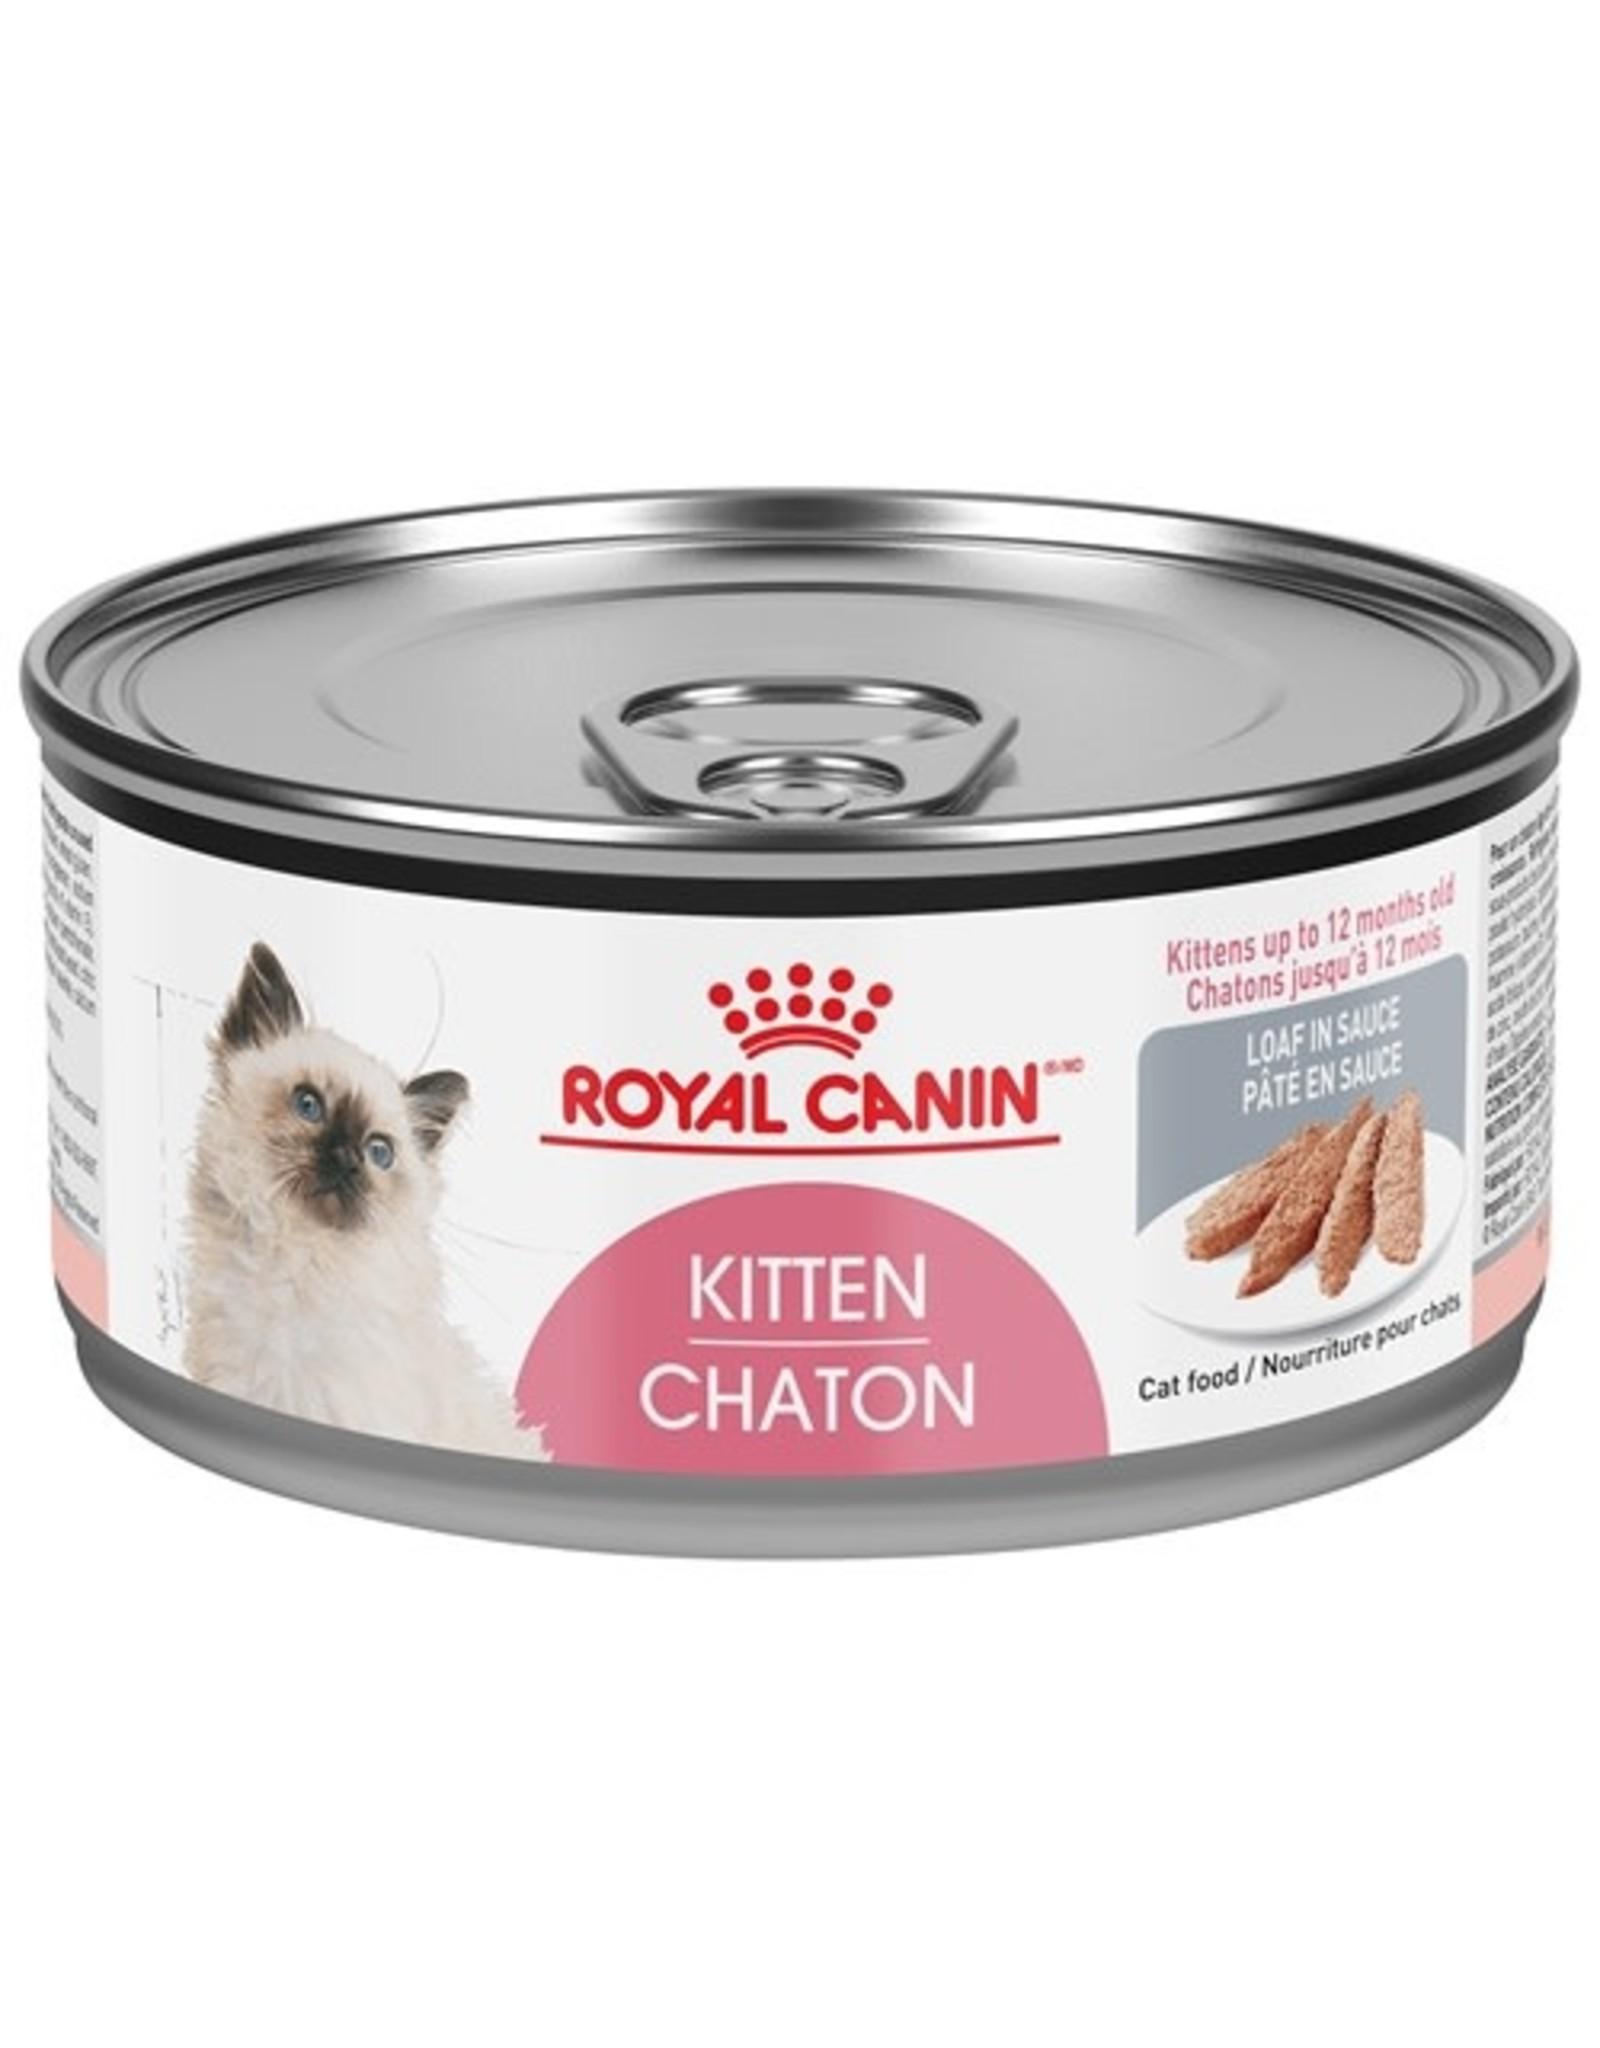 Royal Canin Royal Canin Kitten Instinctive Loaf 145g